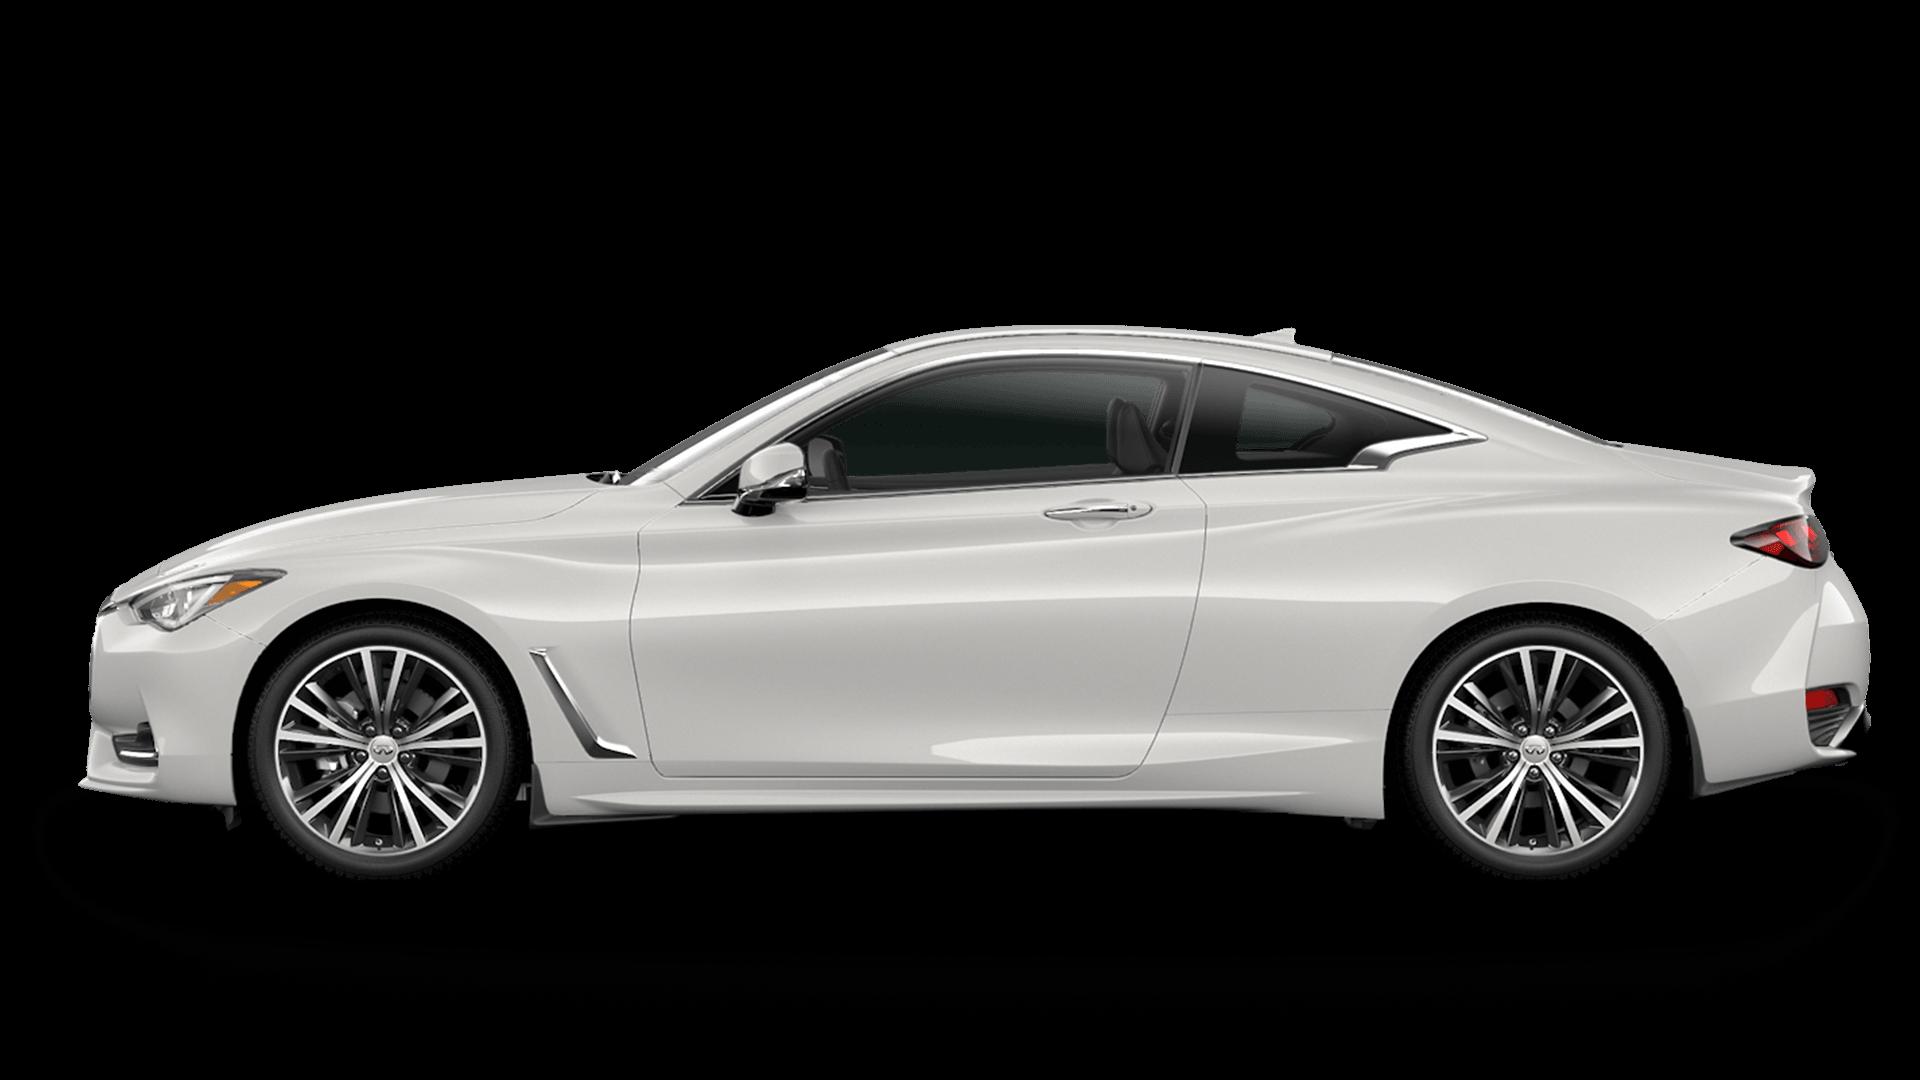 New 2021 Infiniti Q60 Pure AWD model for sale at Oxnard Infiniti dealership near Simi Valley, CA